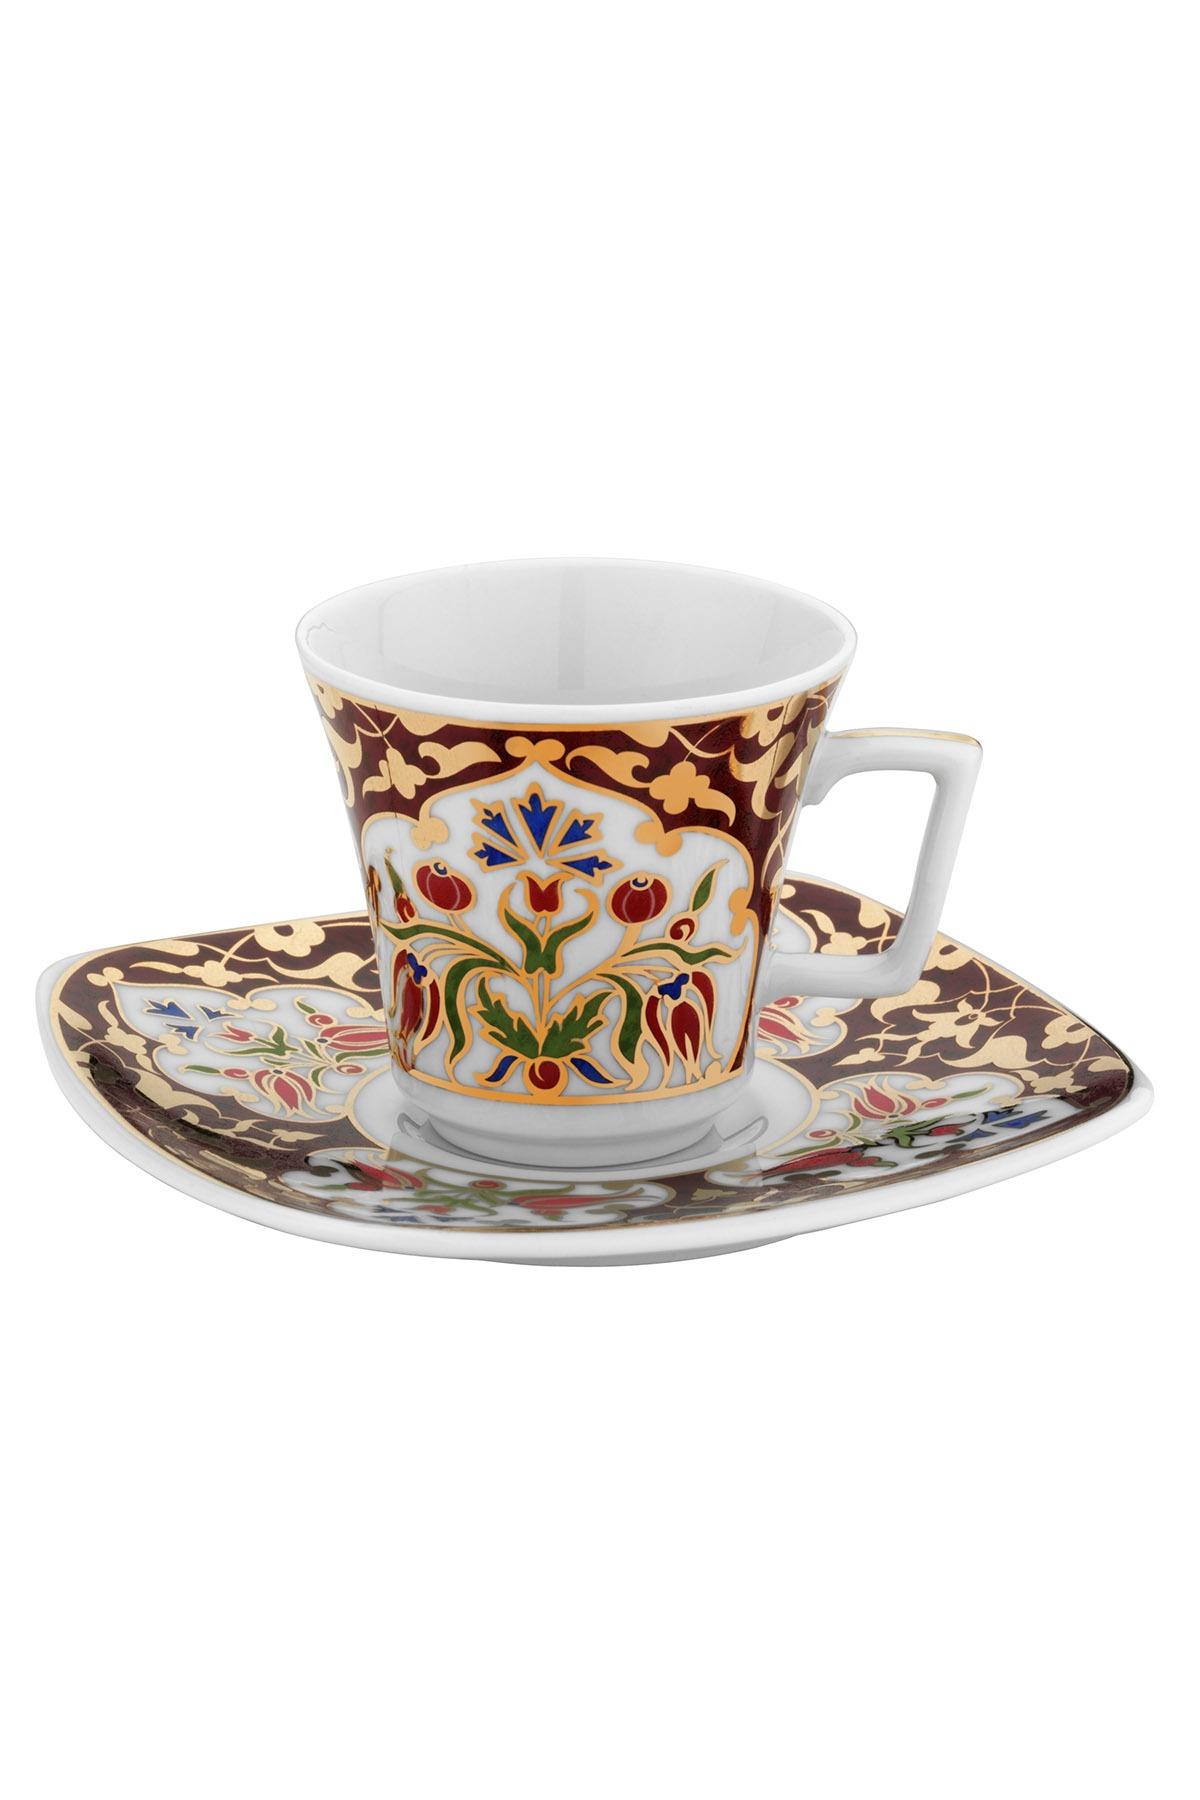 Kütahya Porselen - Kütahya Porselen Medusa 2'li Kahve Takımı Bordo